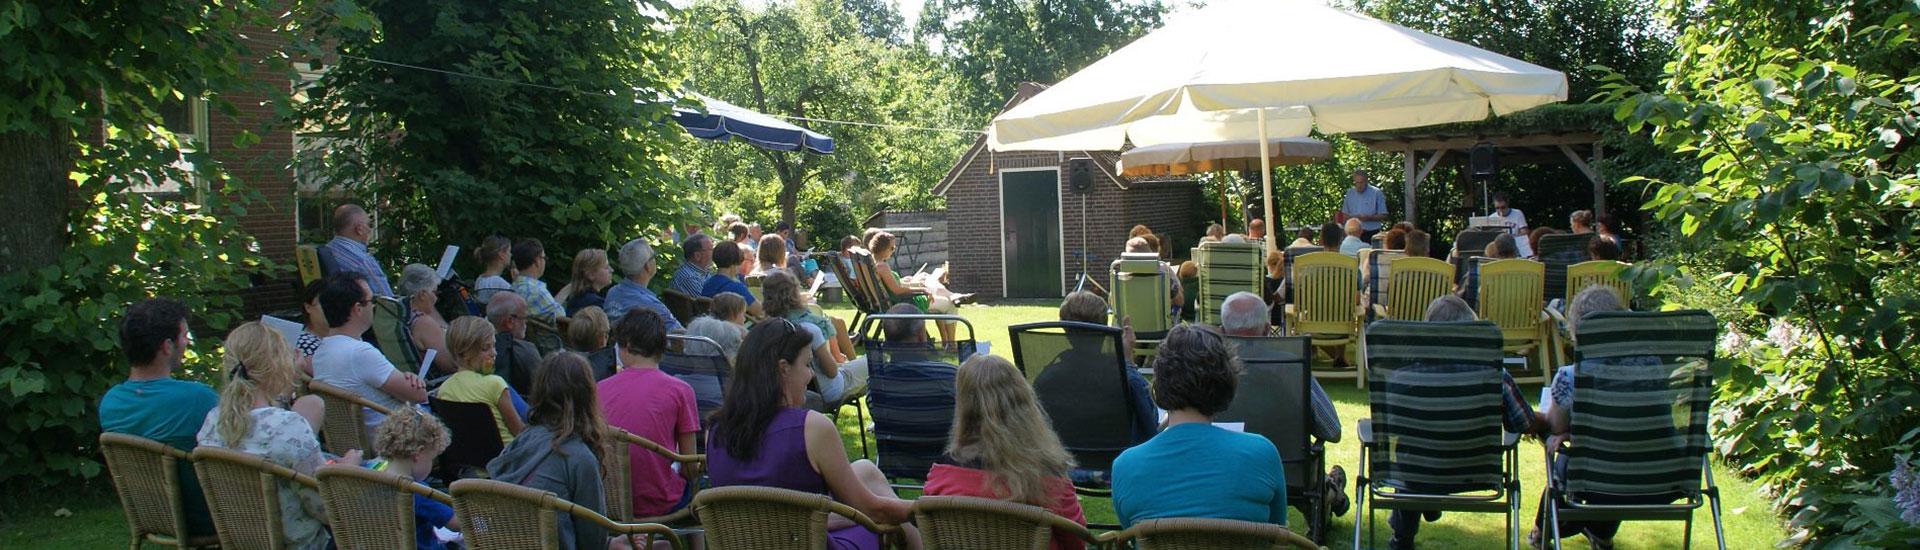 slide_christelijke_camping_drenthe_meistershof1